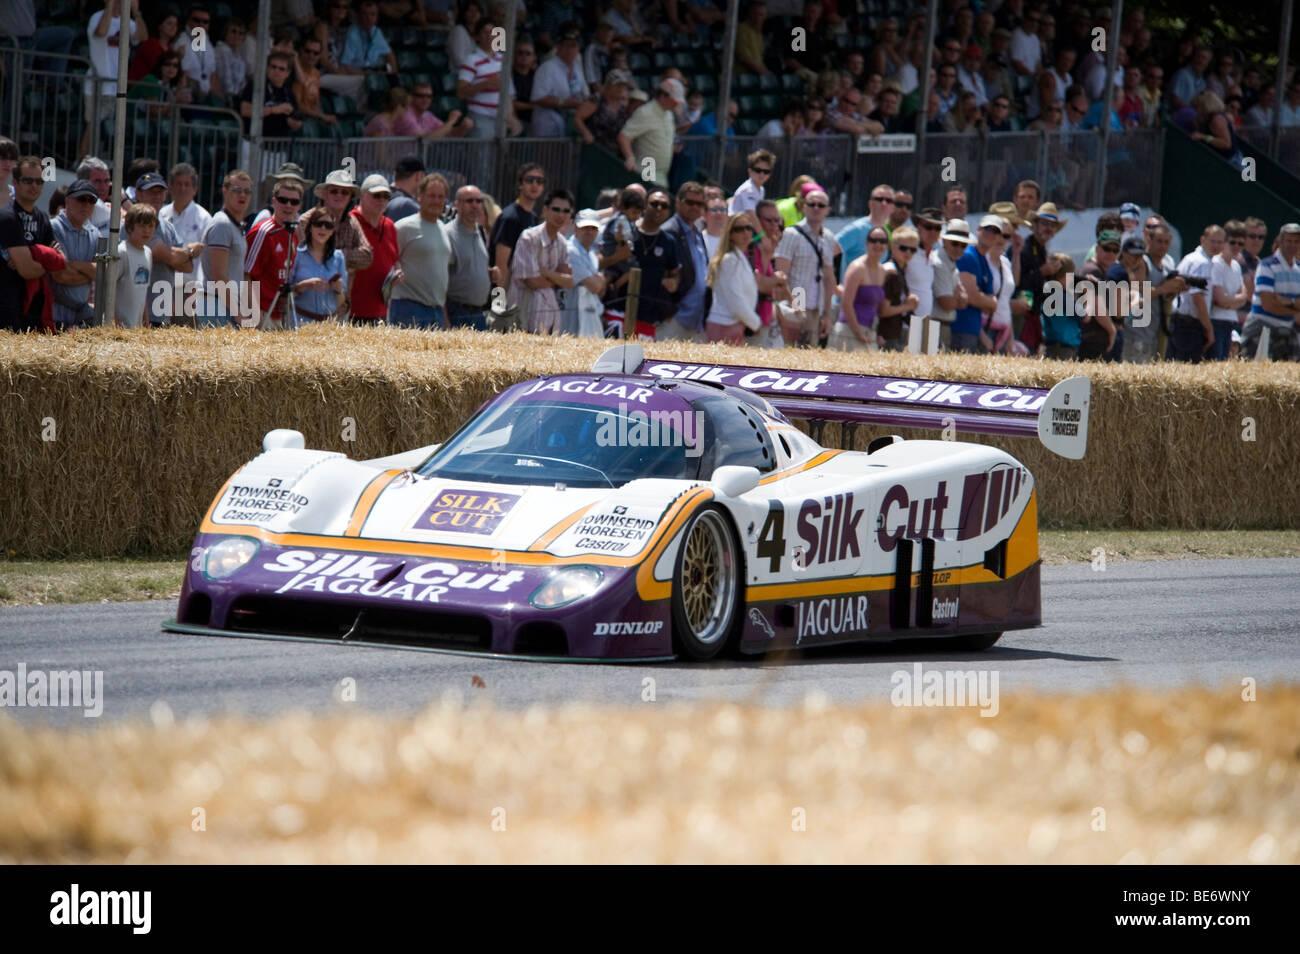 Silk Cut Jaguar XJR-8/9 at Goodwood Festival of Speed - Stock Image